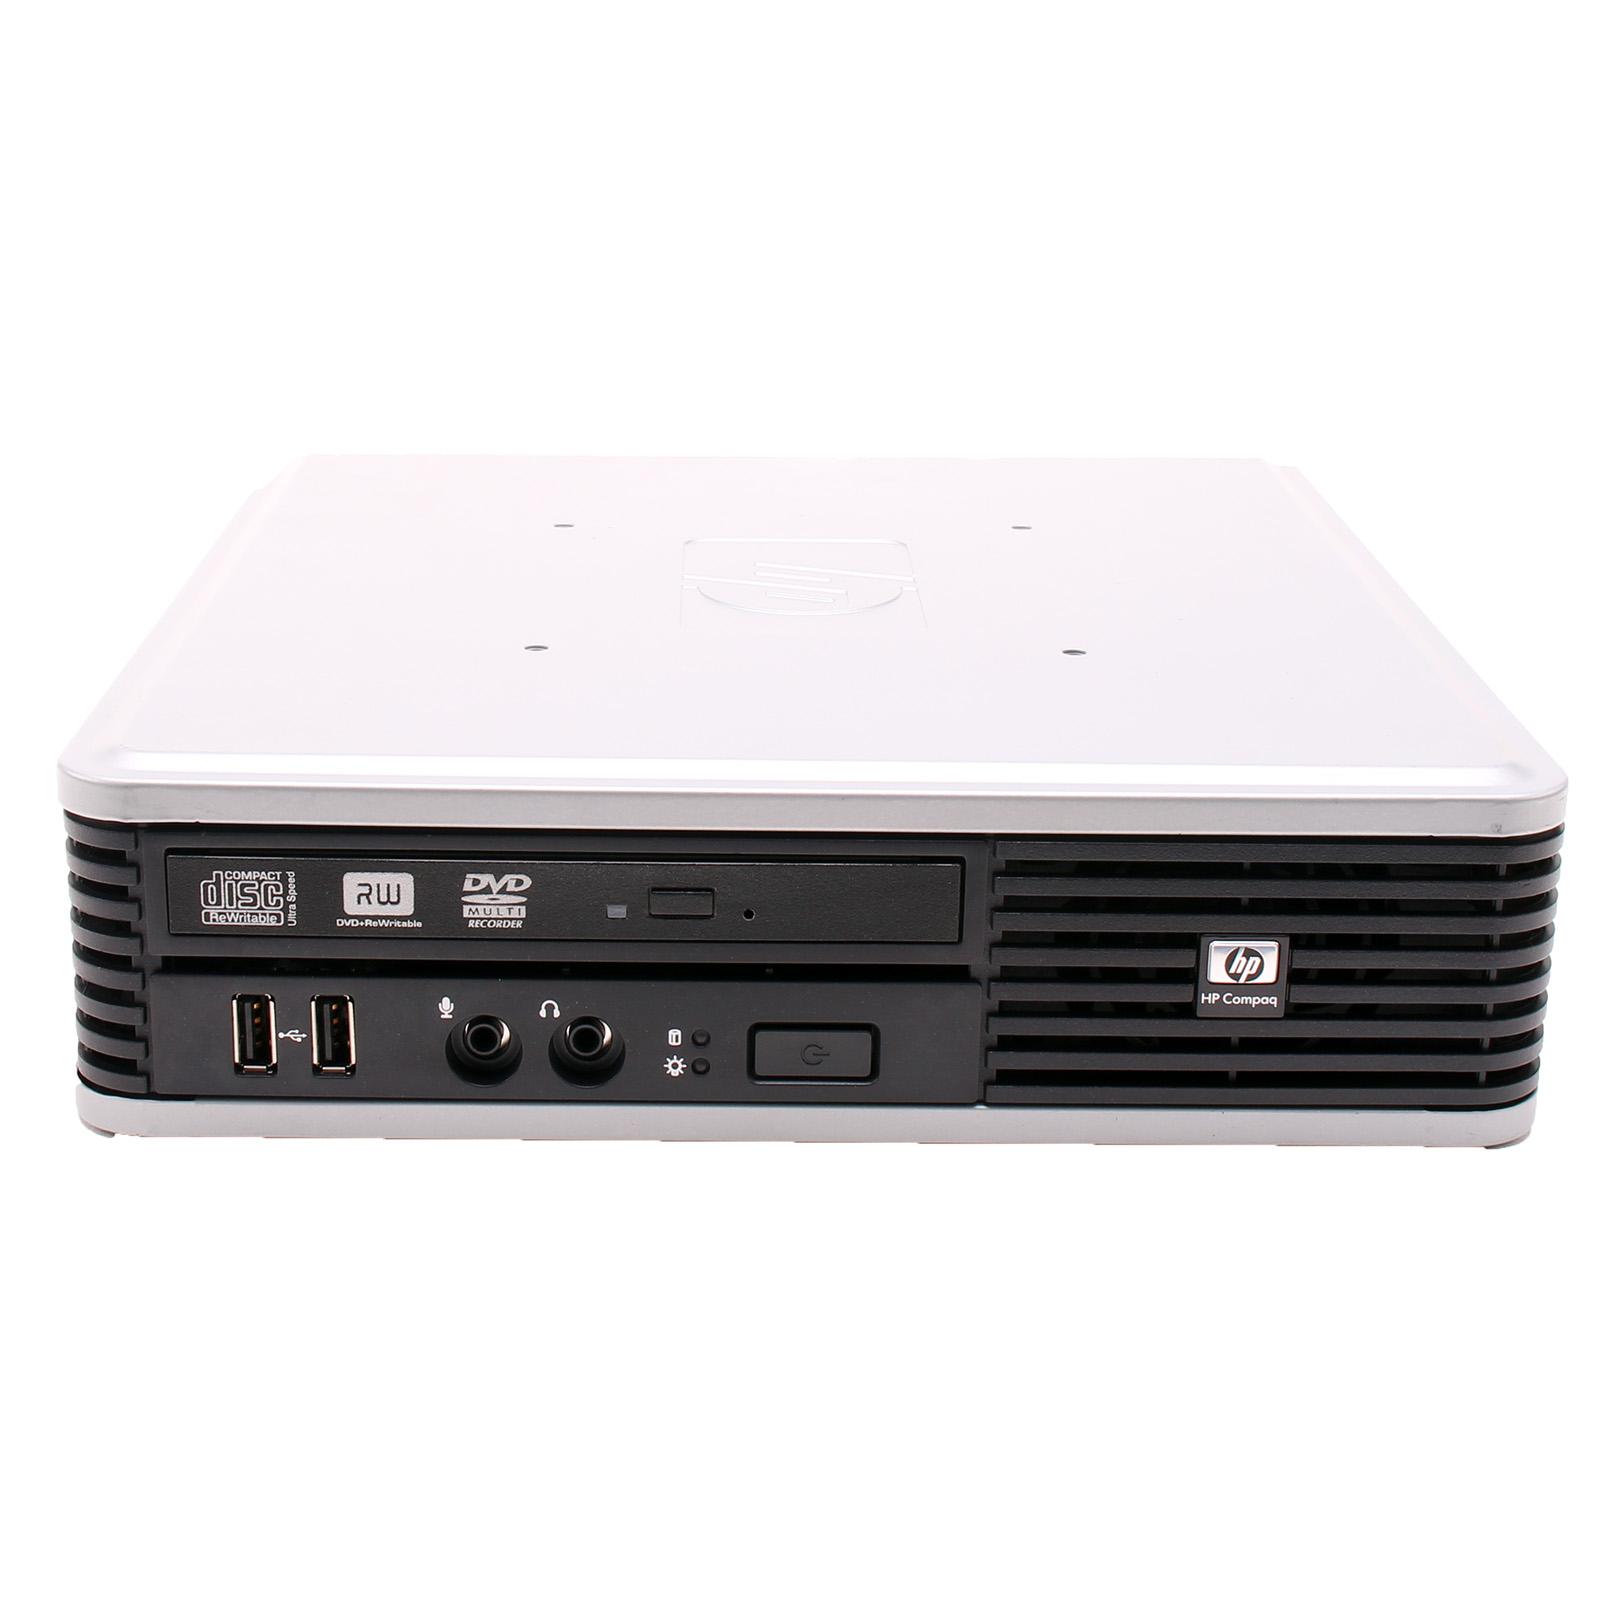 DESKTOP HP COMPAQ DC7900 SFF C2D-E8400/4GB/160GB/DVD